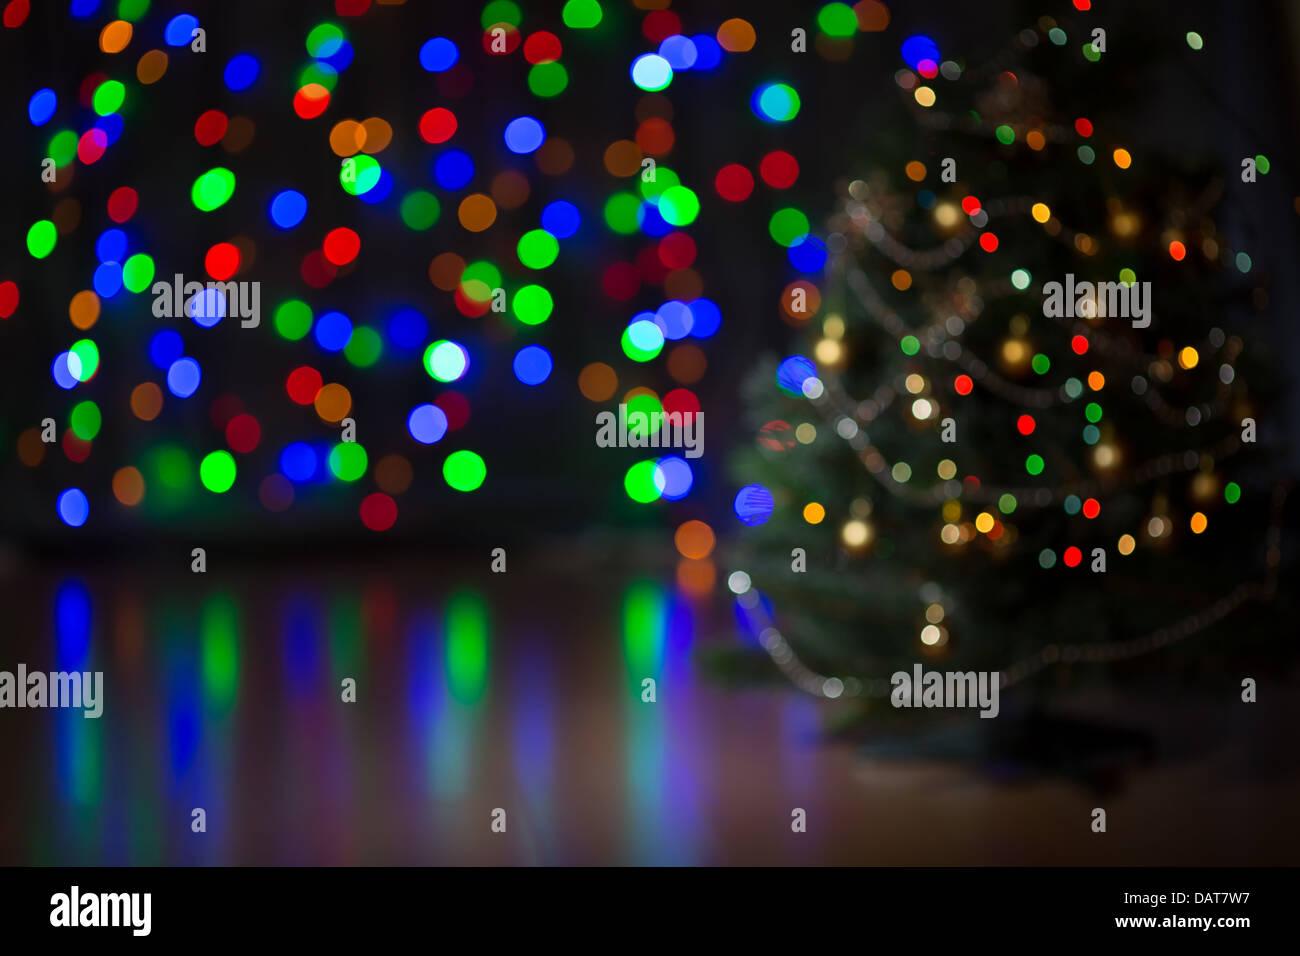 Christmas tree blurred background Stock Photo